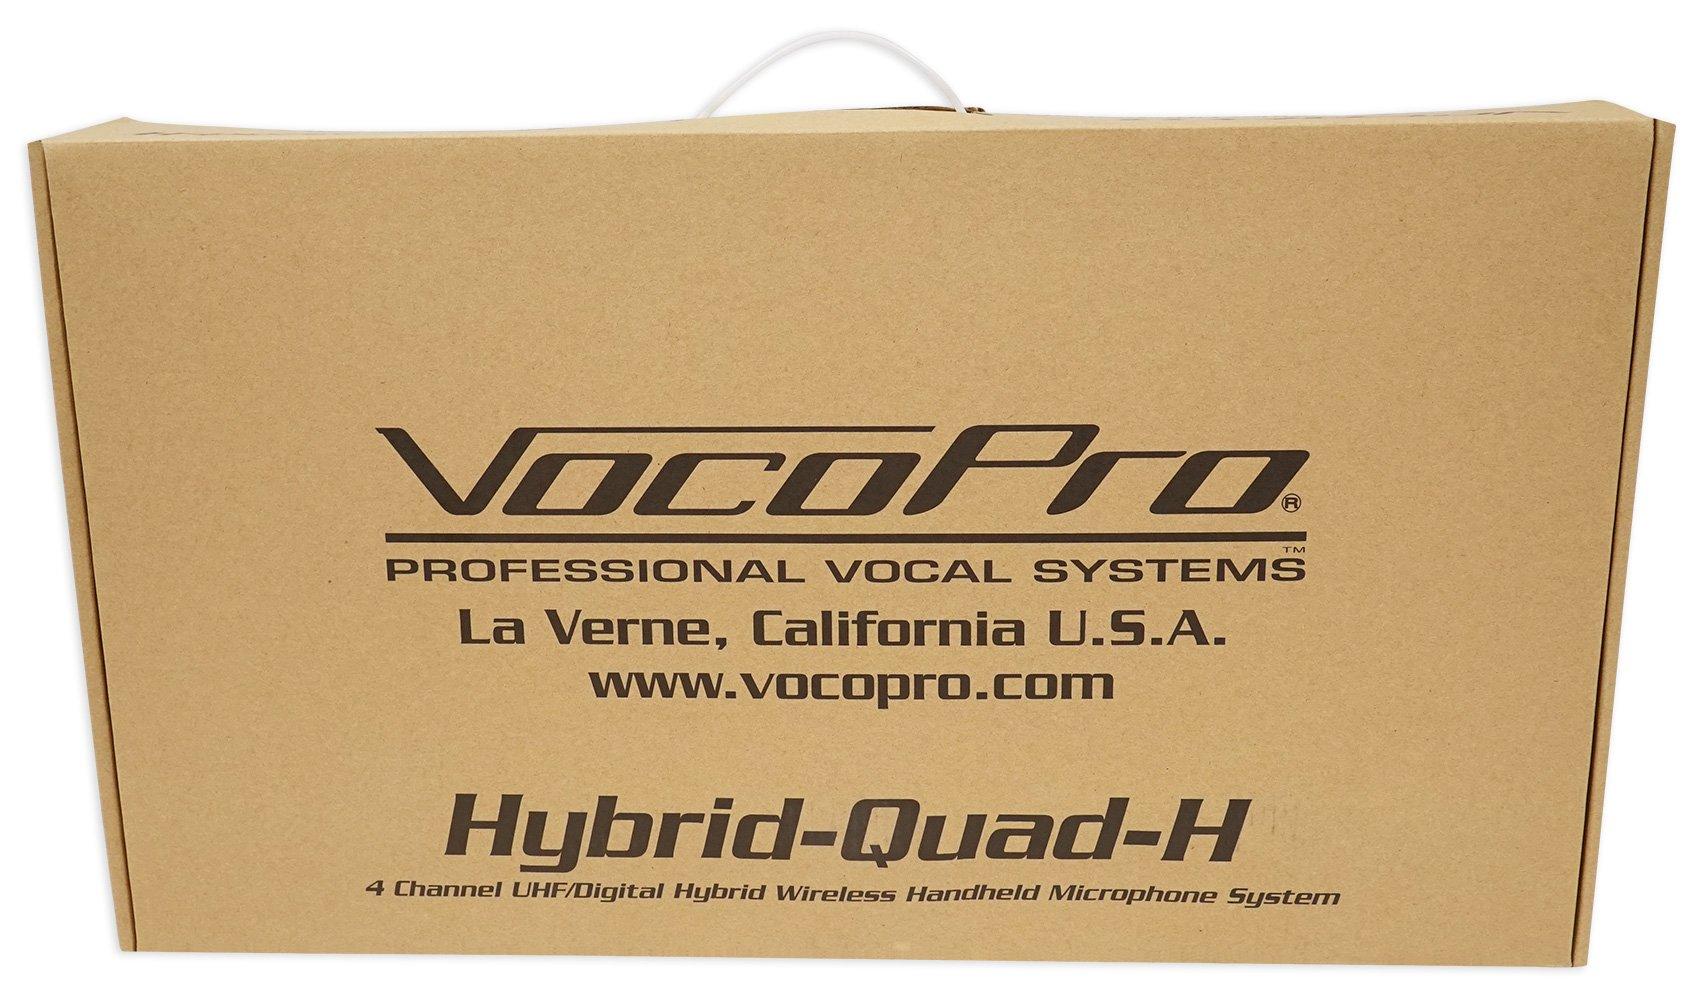 VOCOPRO Four-Channel UHF Digital Wireless Handheld Microphone Mics System-H4